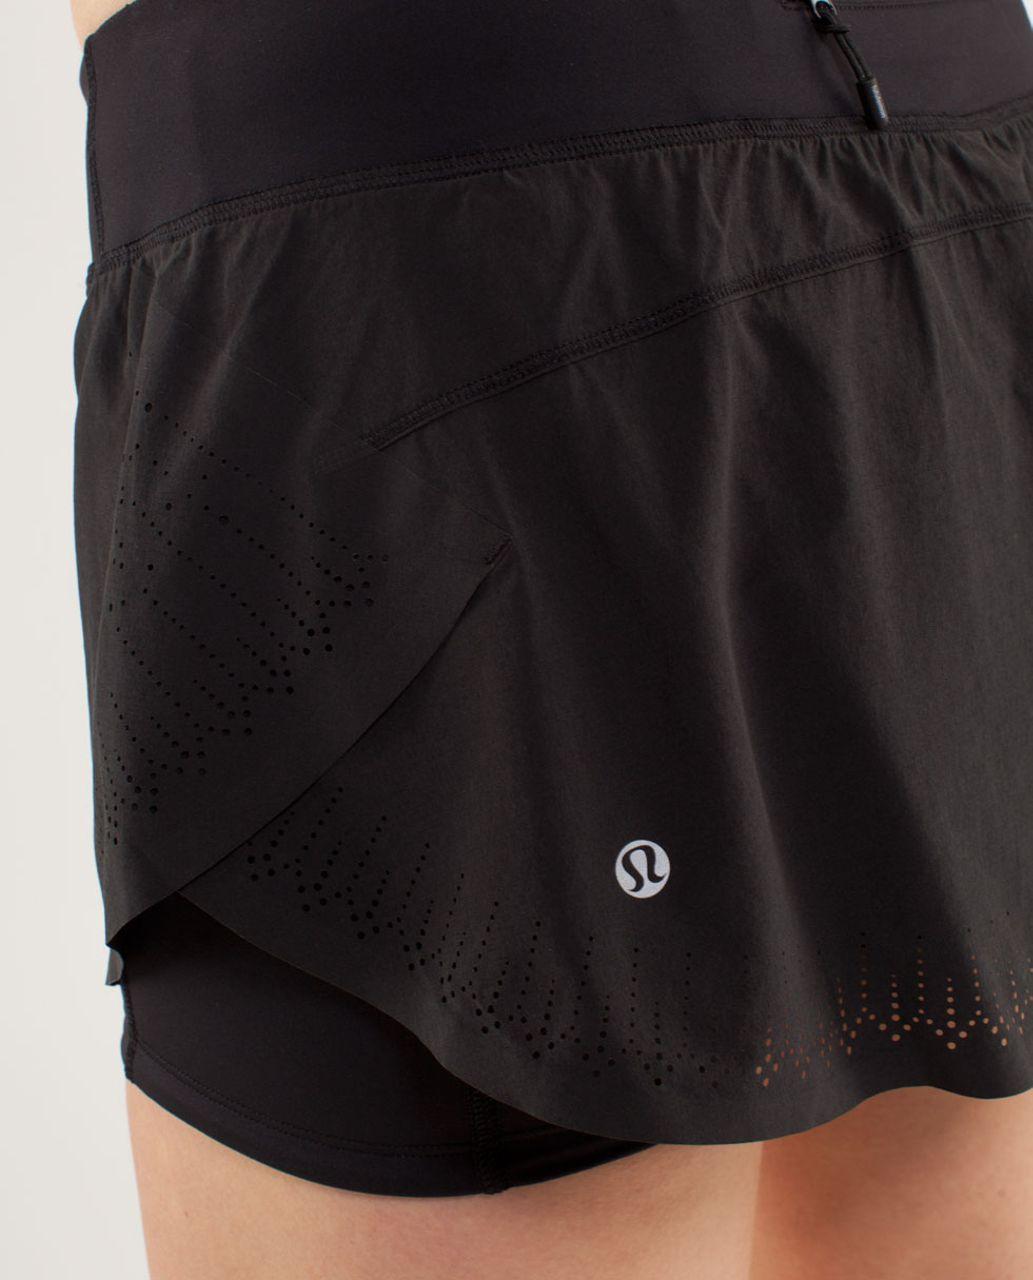 Lululemon Run:  Light As Air Skirt - Black